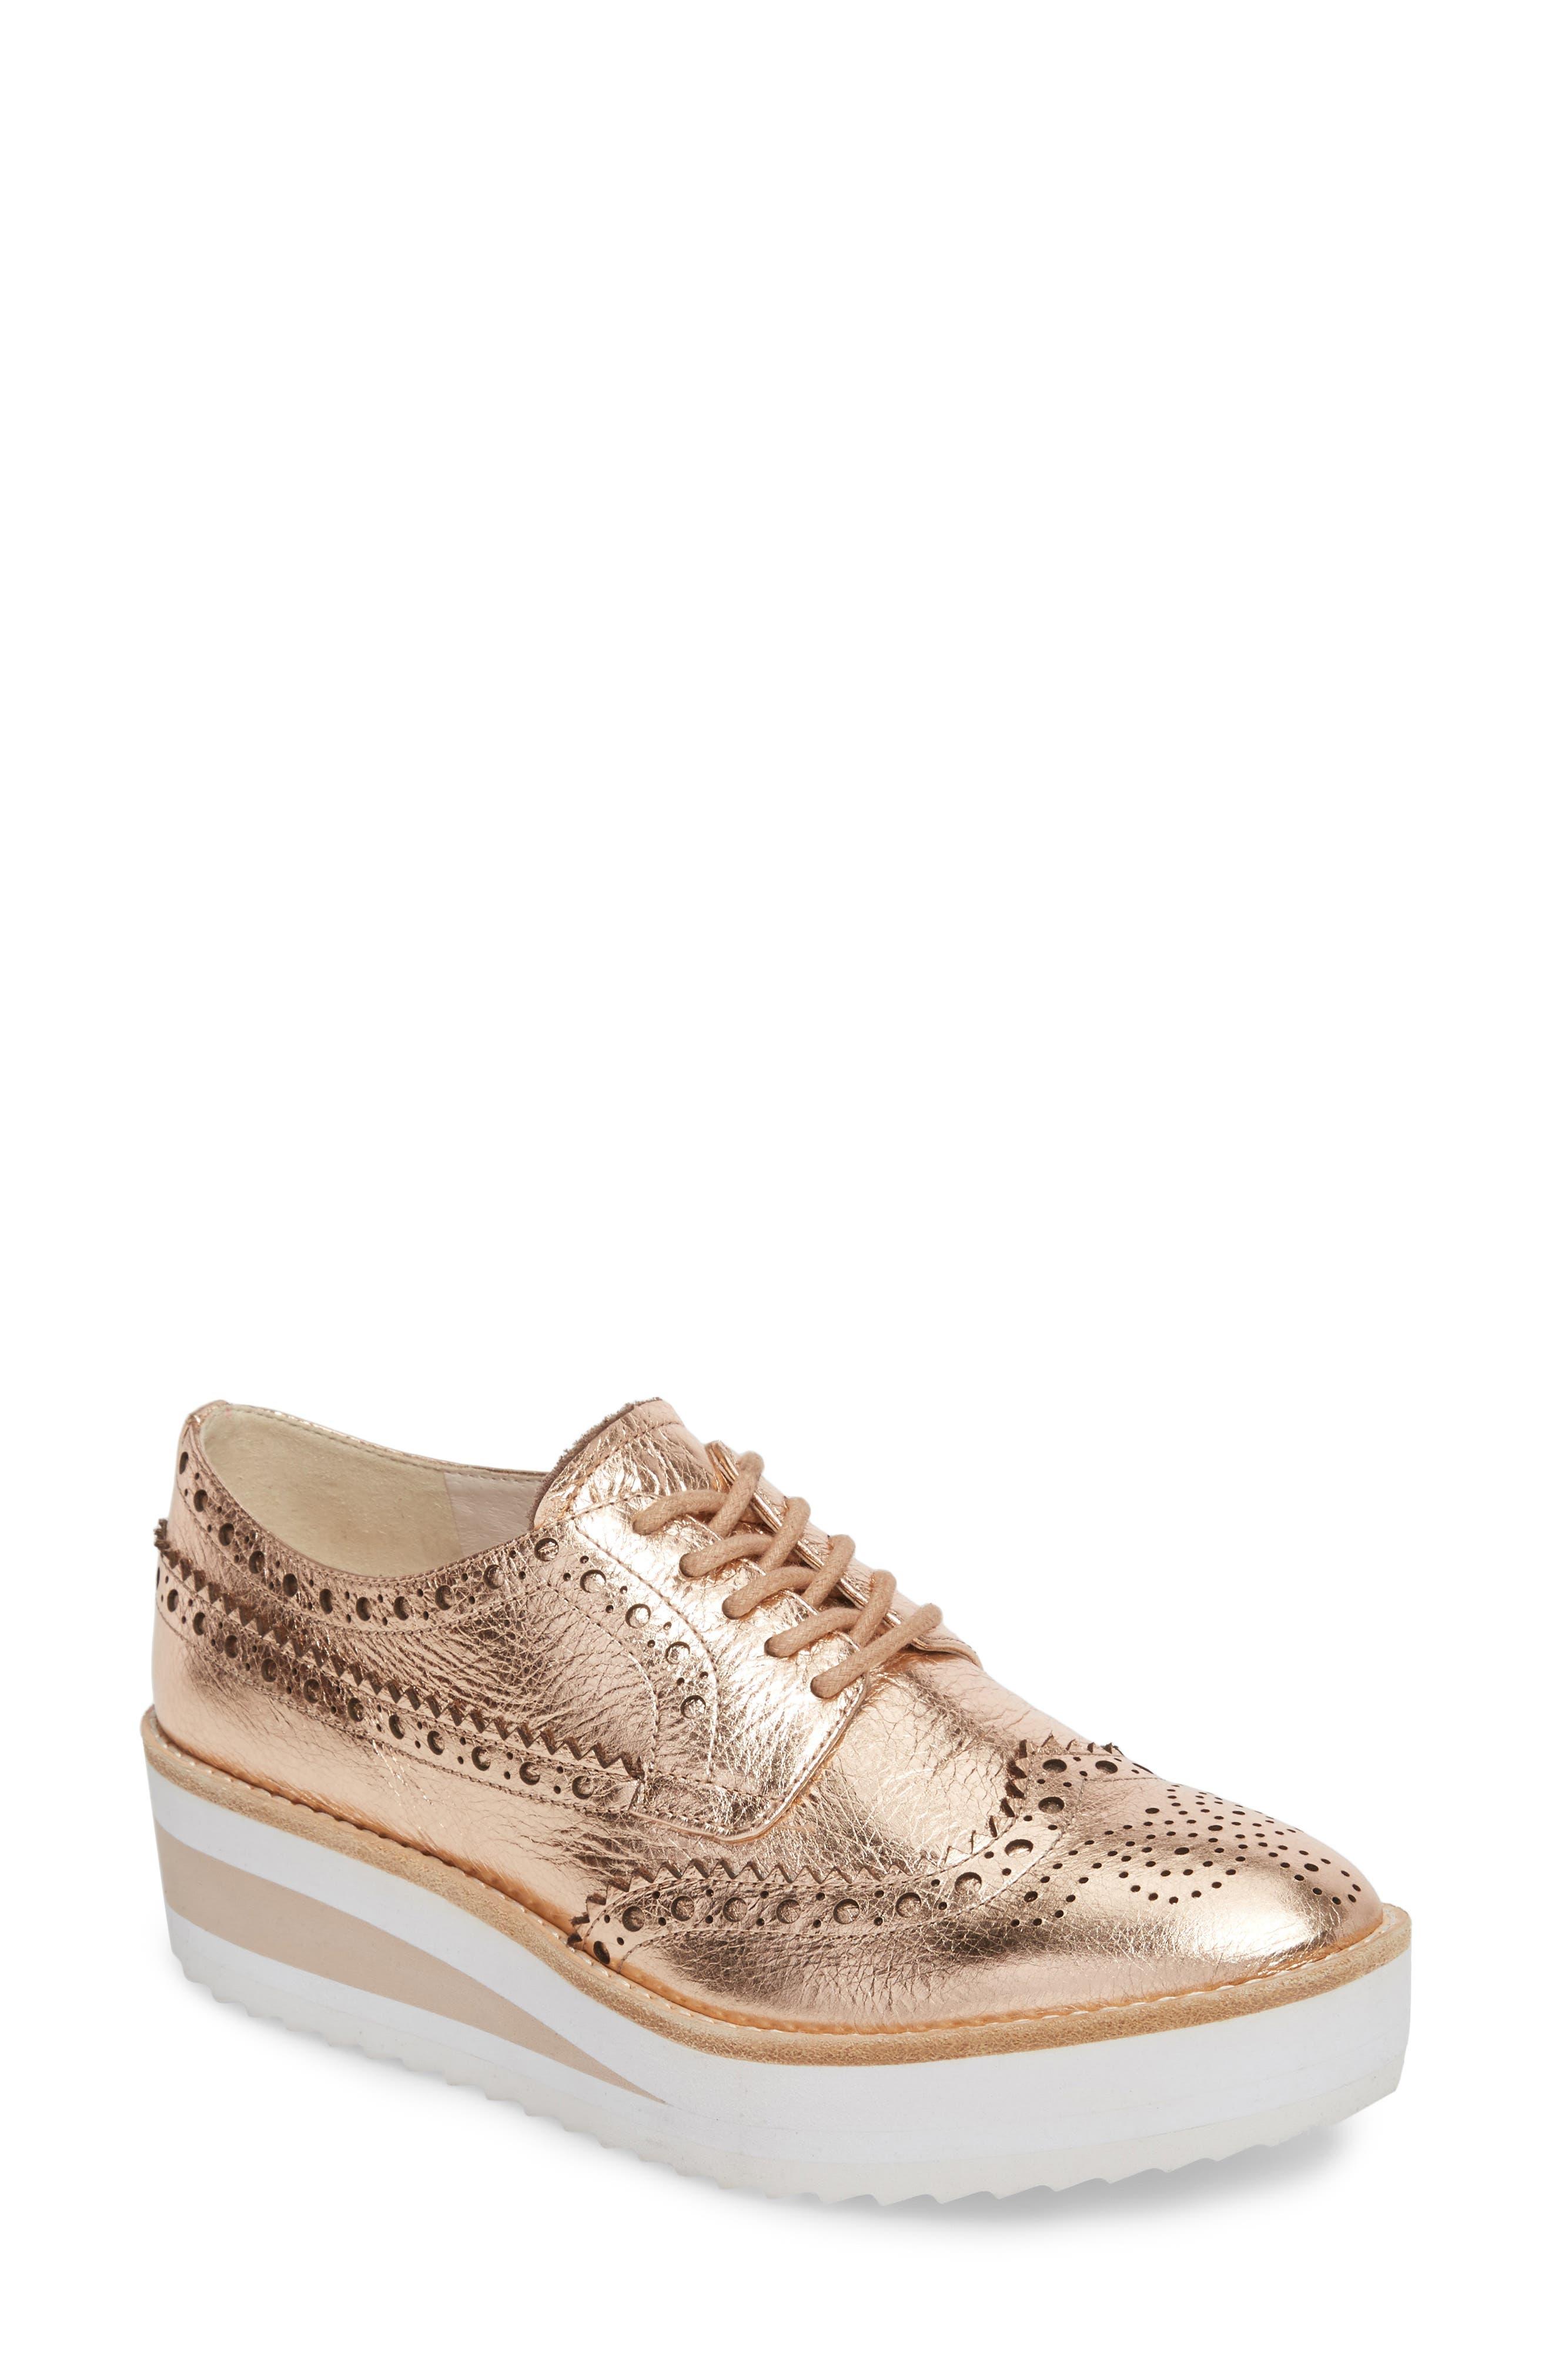 Main Image - Kenneth Cole New York Roberta Platform Sneaker (Women)